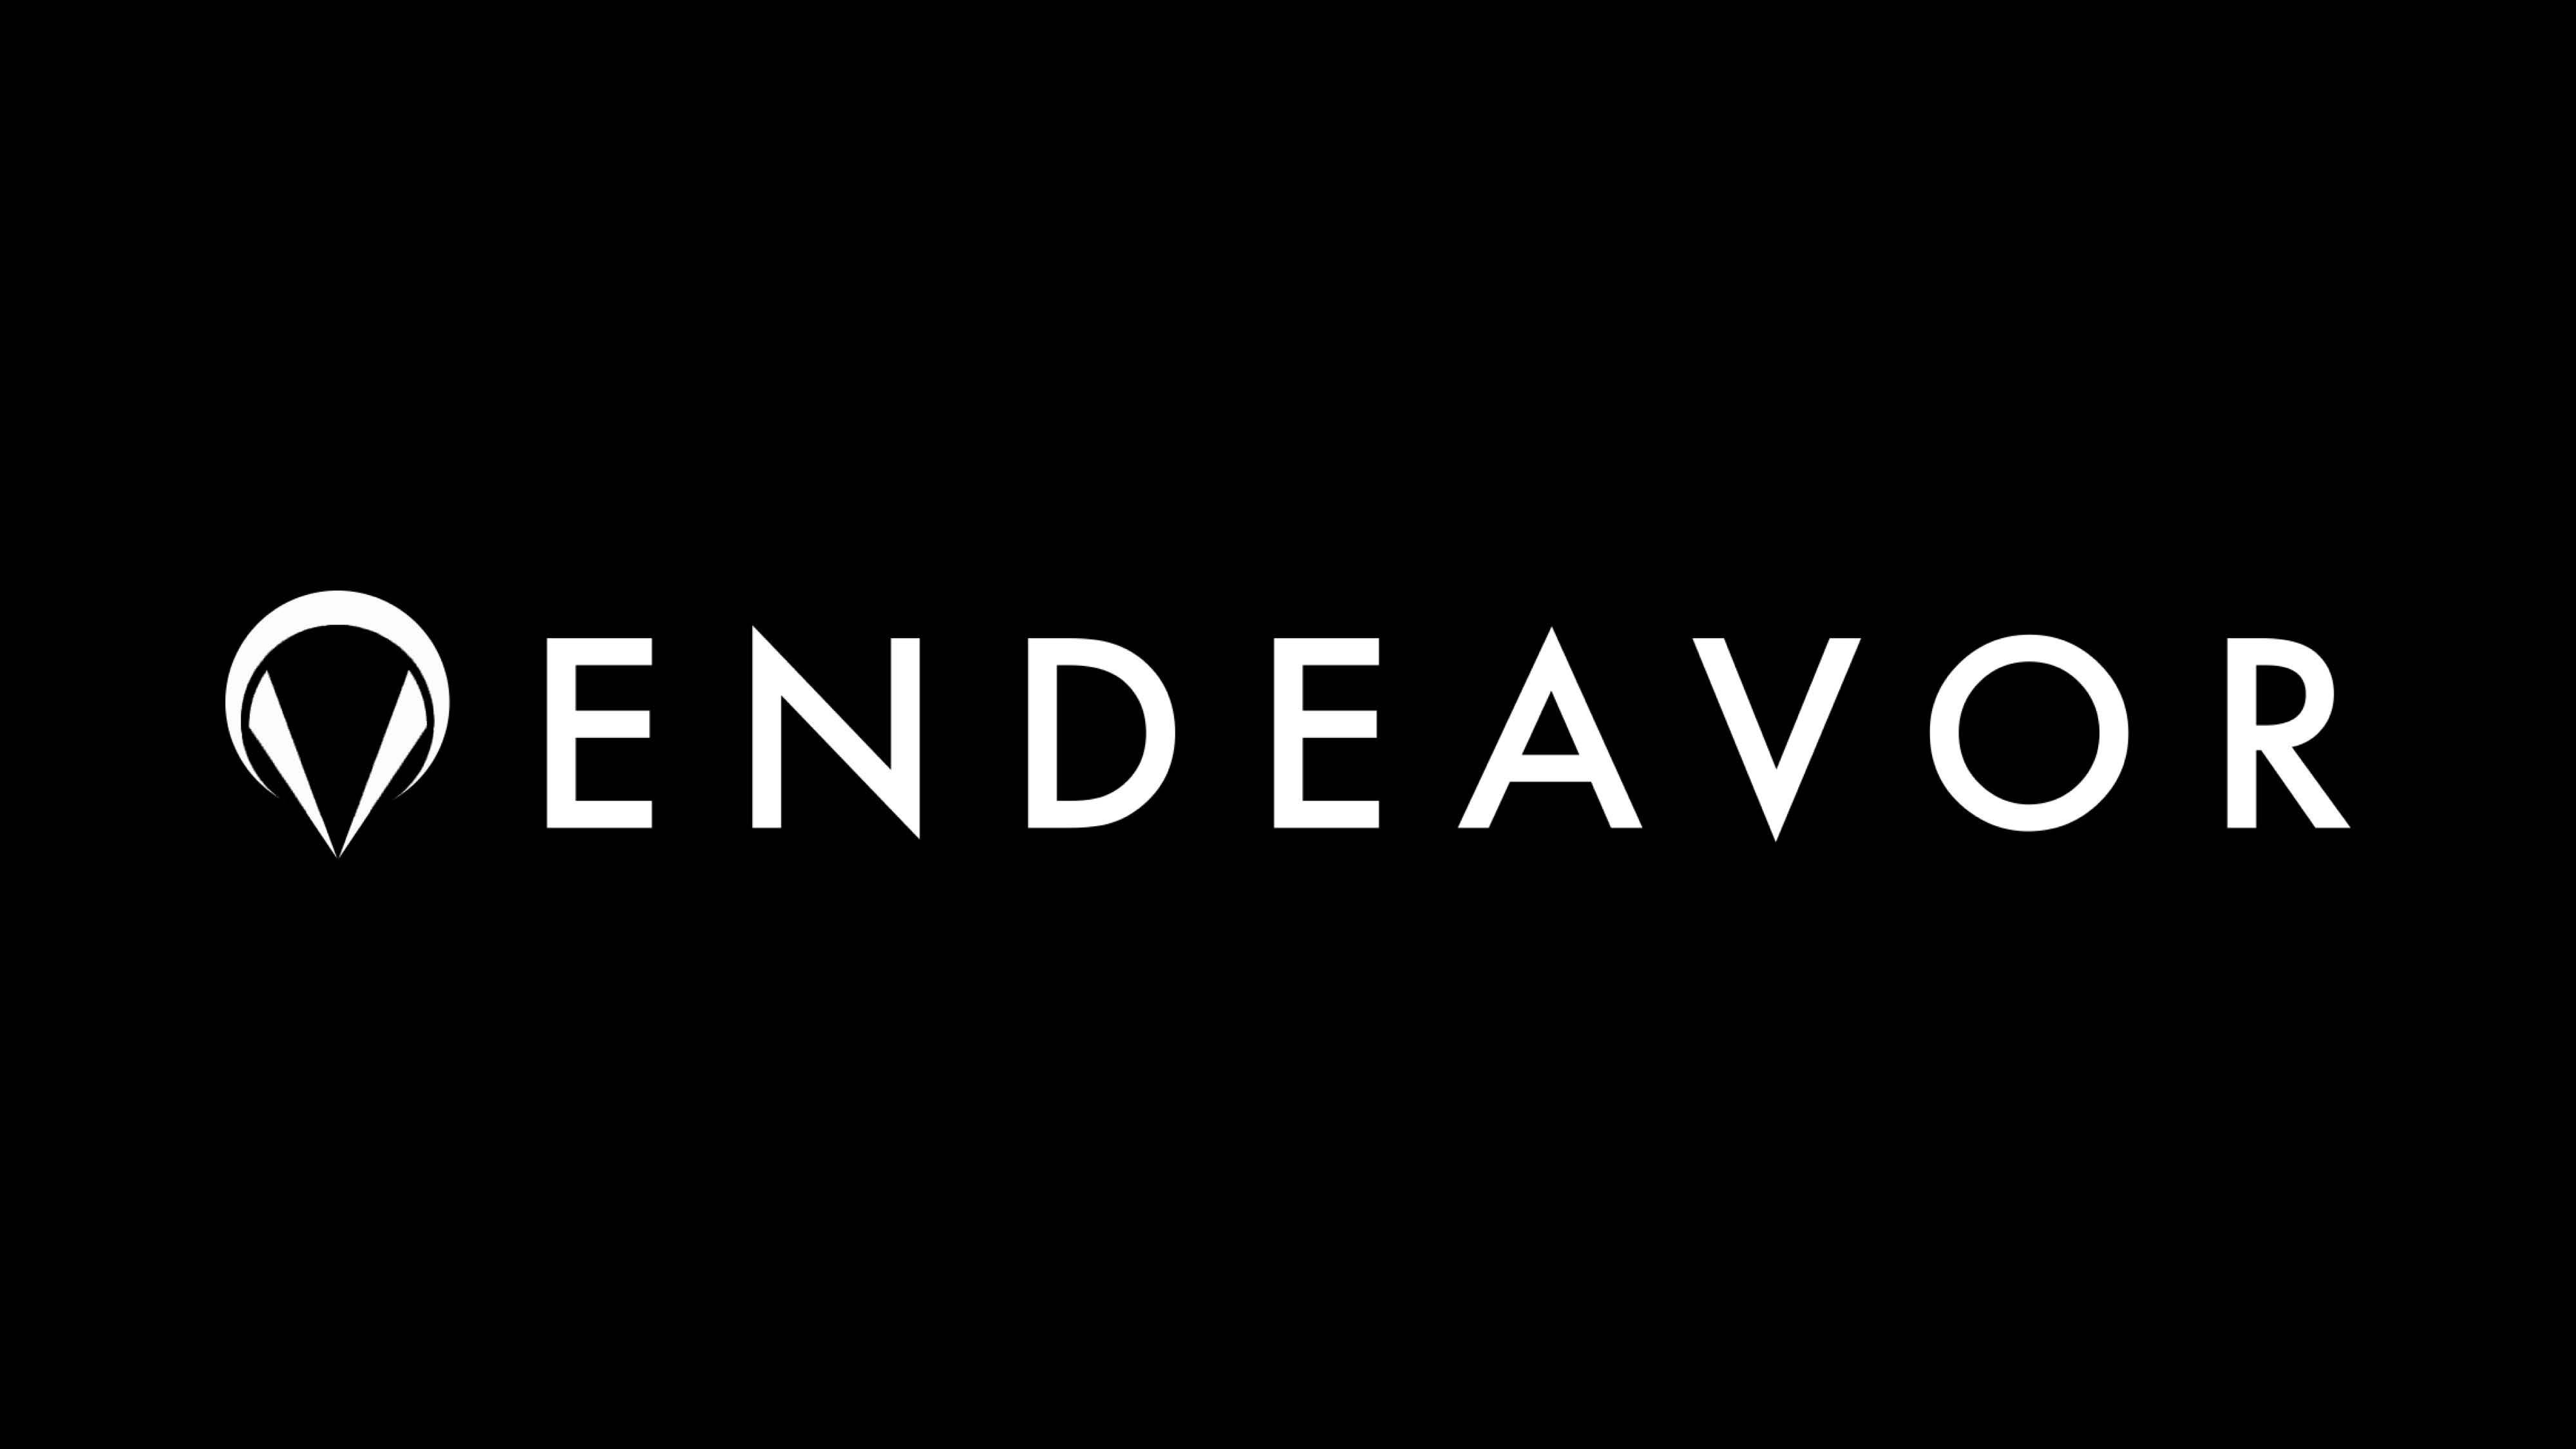 endeavor_20.jpg